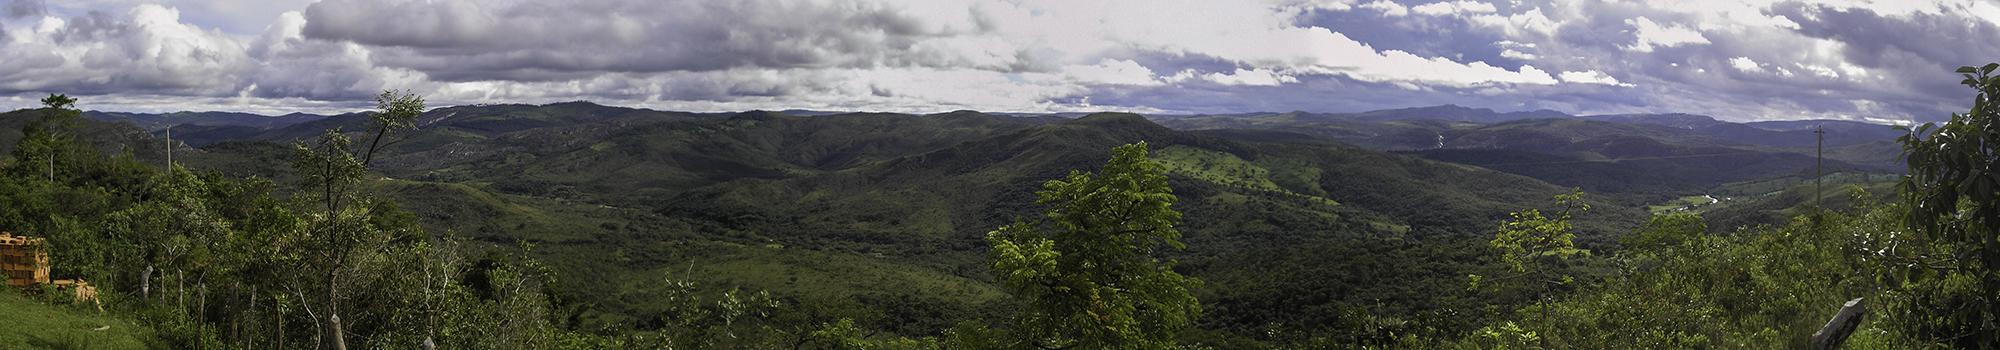 SCVeZooDis_banner_mountain_range_3